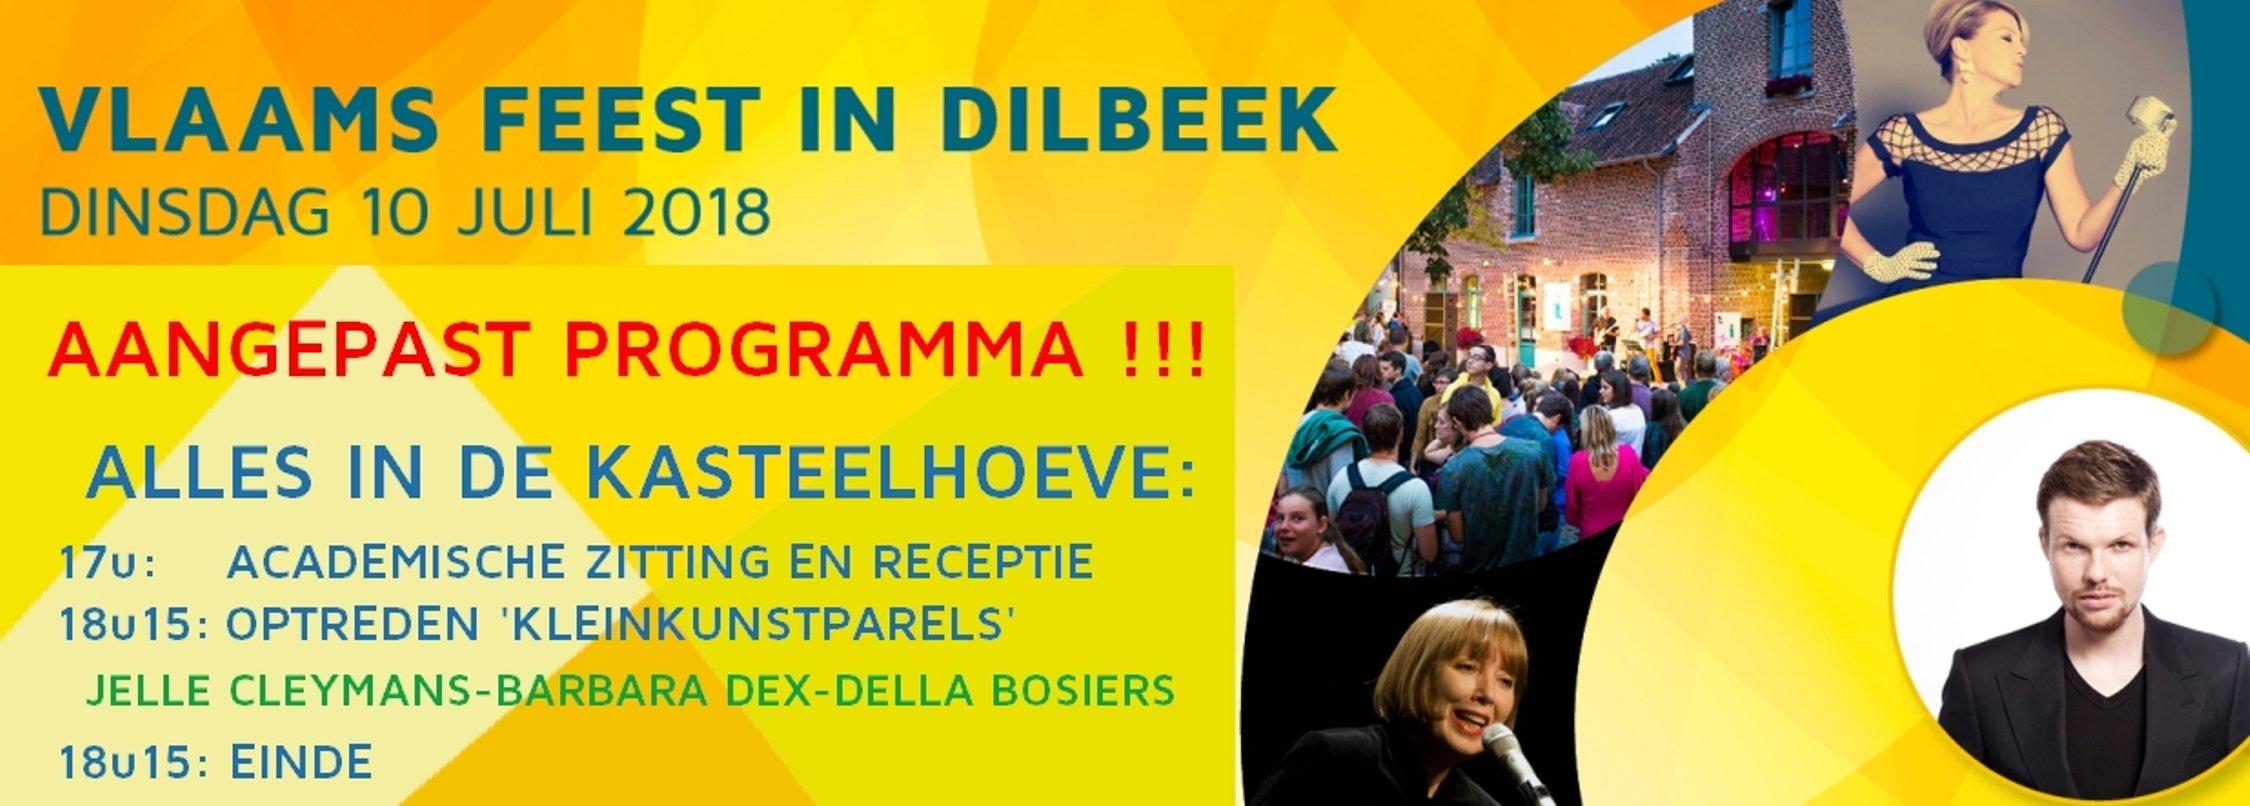 Dilbeek gaat dinsdag een Vlaamse en Duivelse Feestavond tegemoet - Aangepaste banner Vl Feest 2018